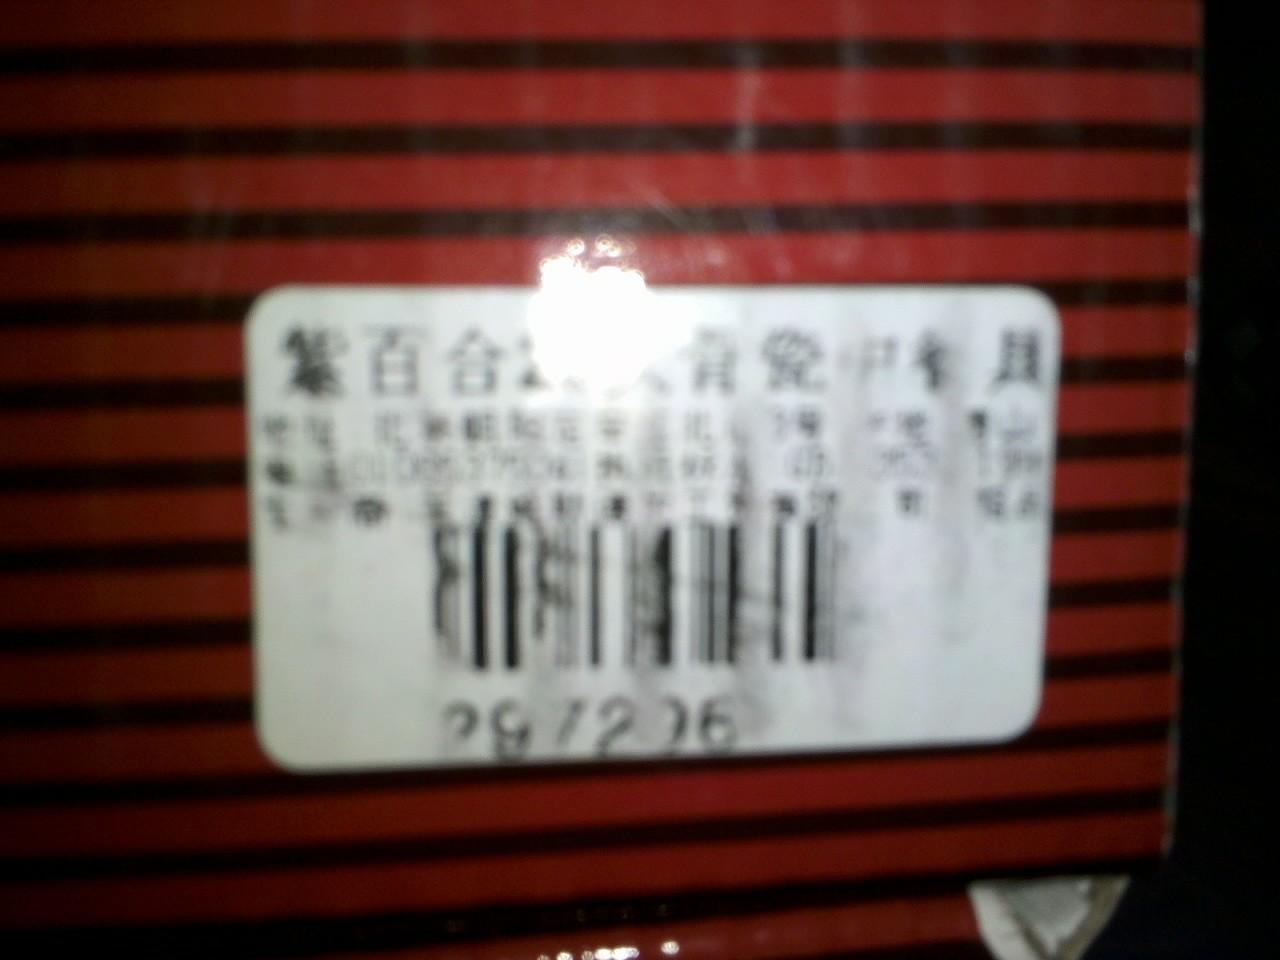 nike bowerman running shoes 00218237 wholesale